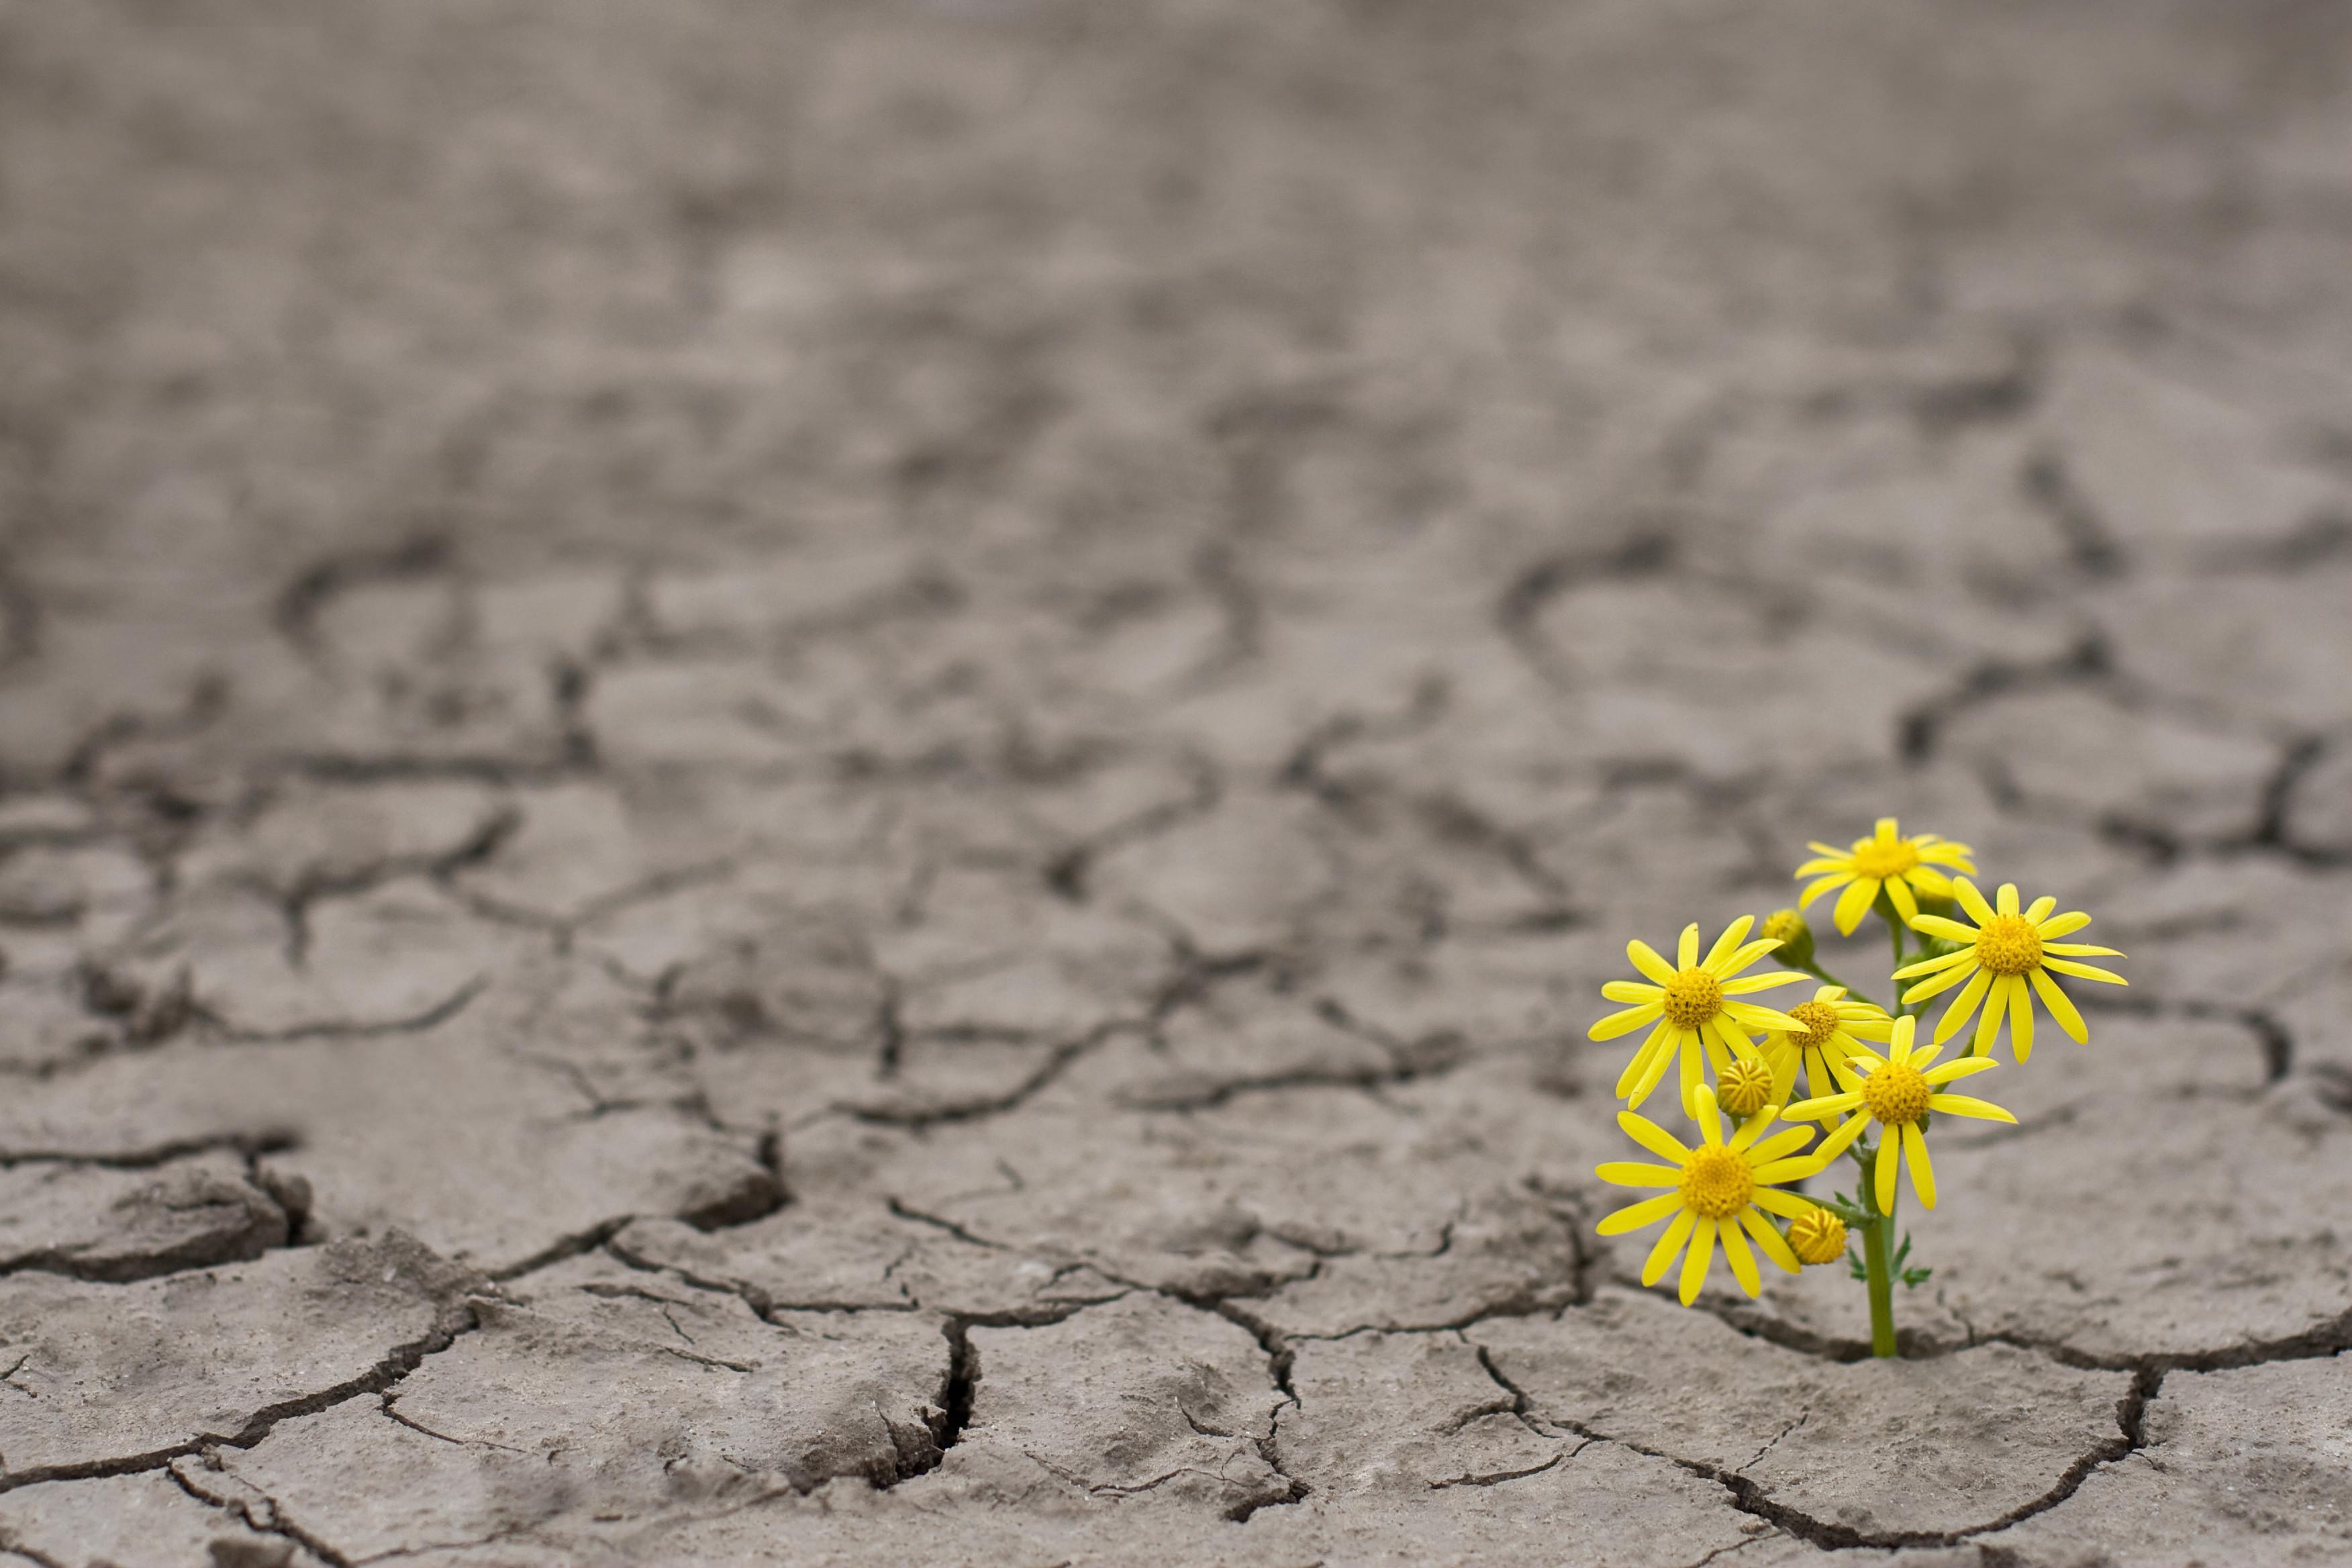 Choosing joy during difficult times